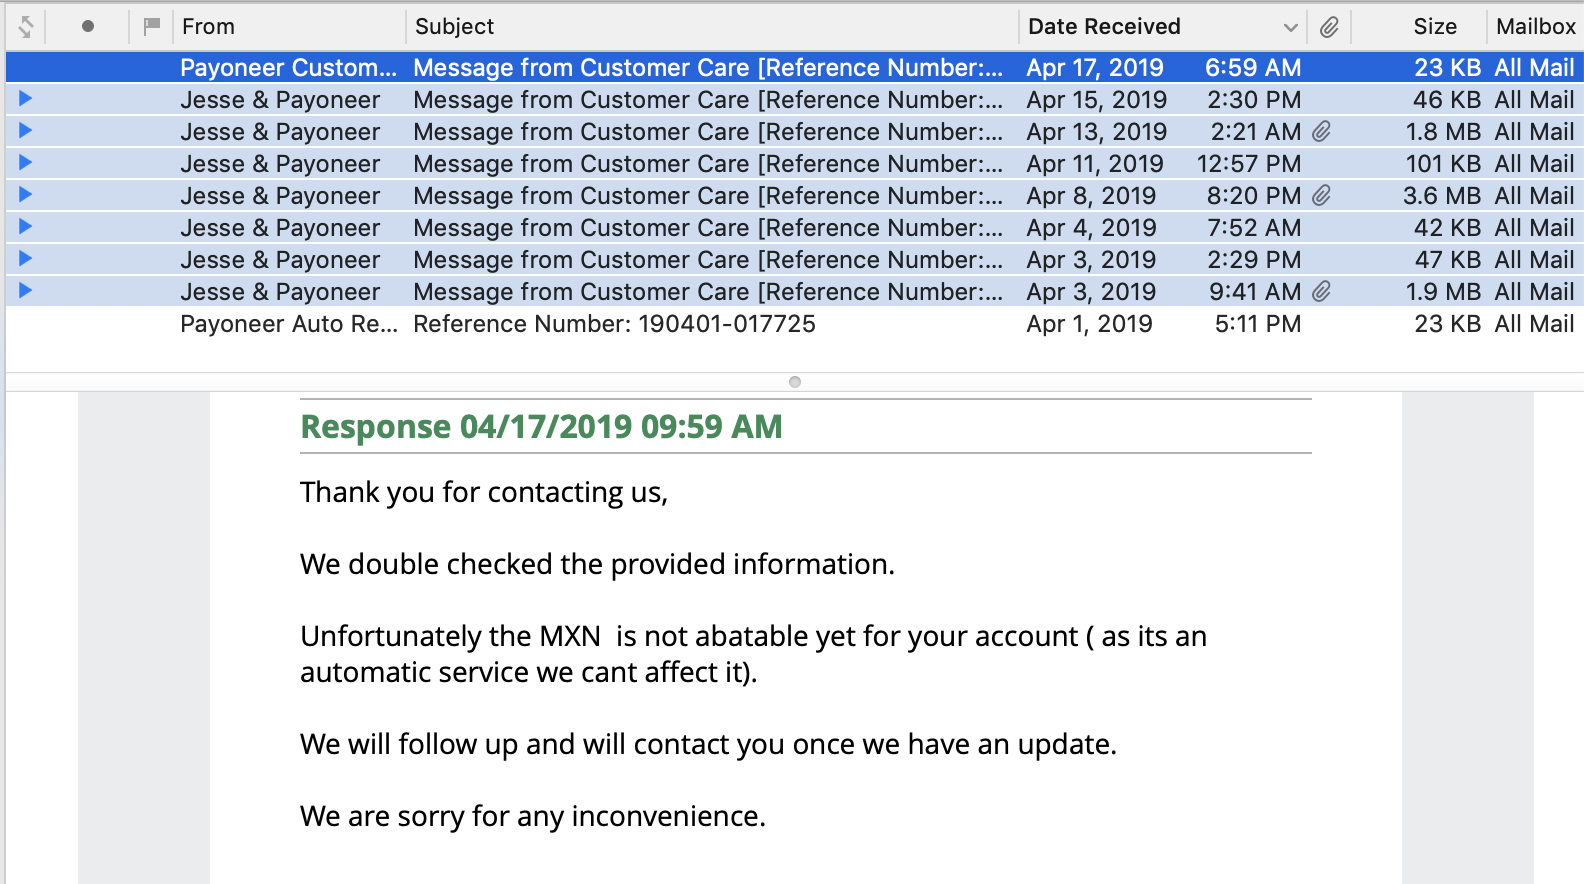 Customer Care Message